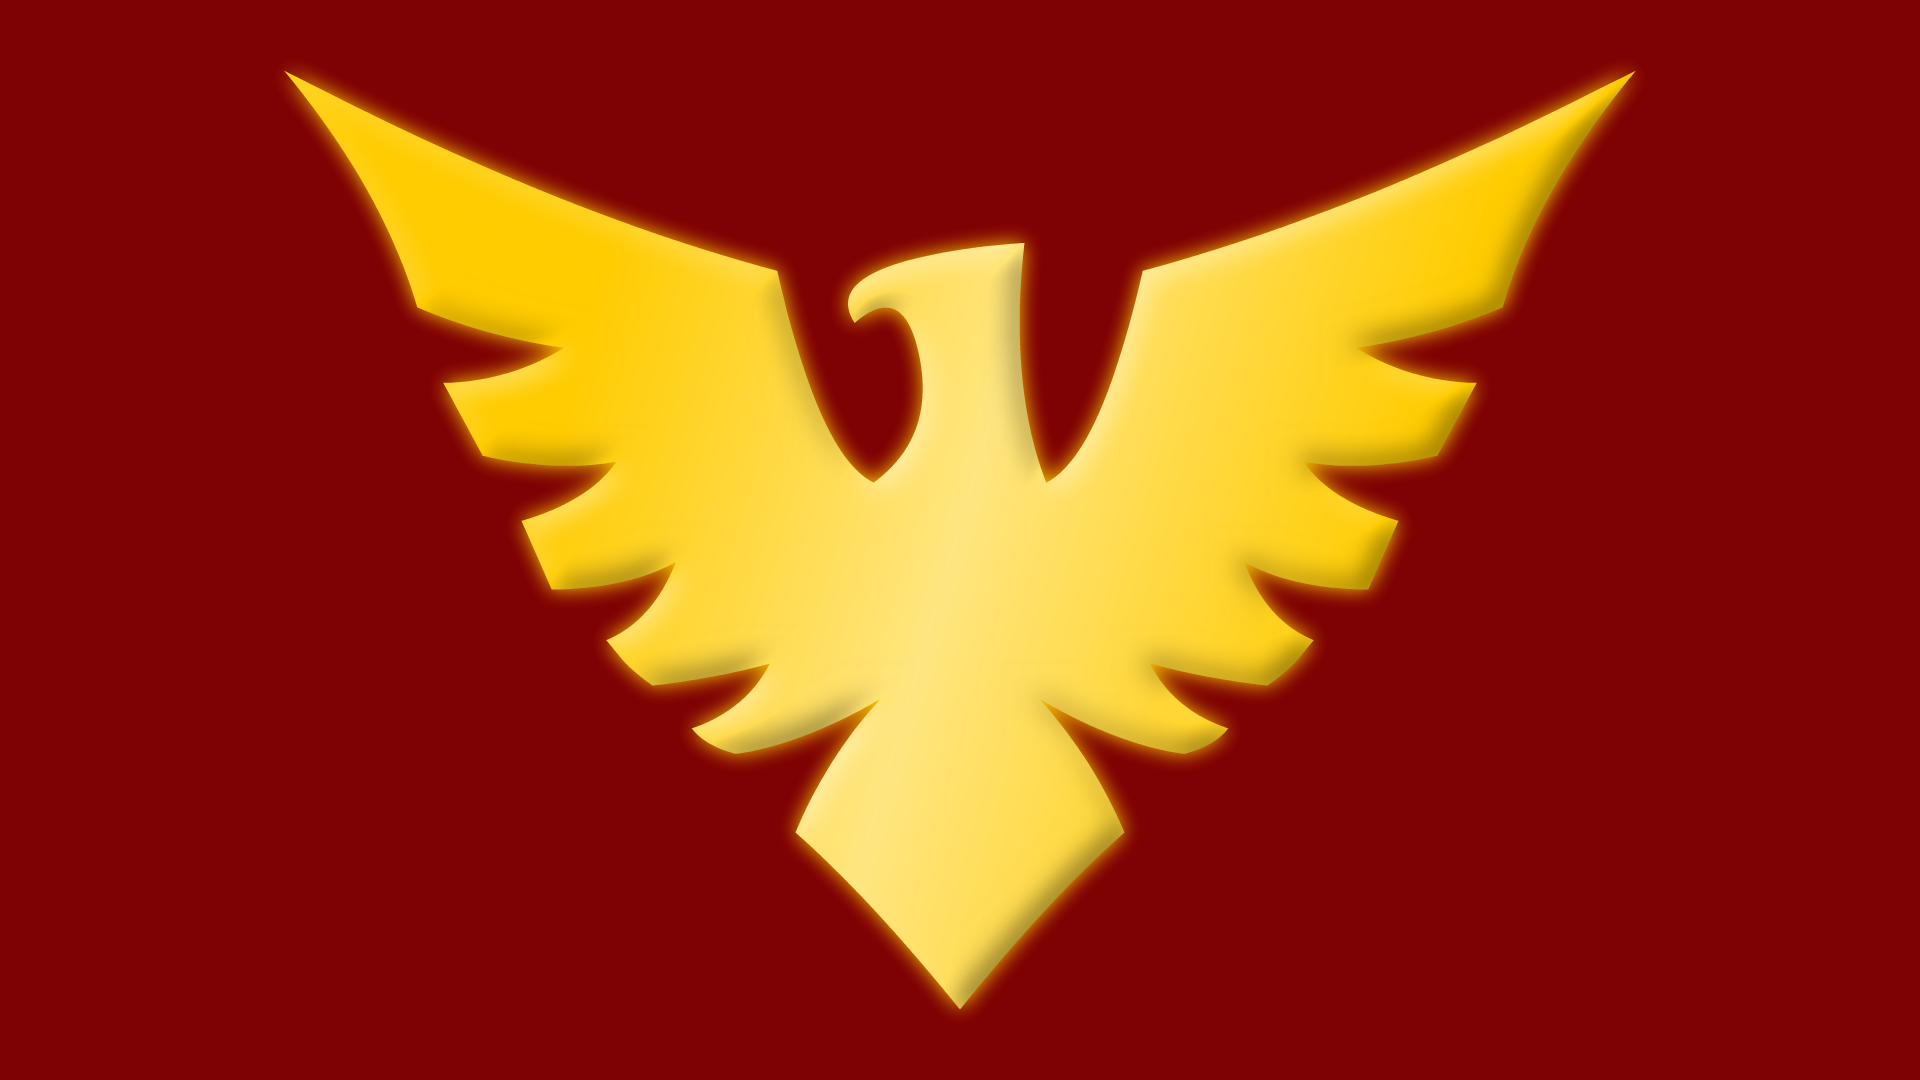 Phonix symbol